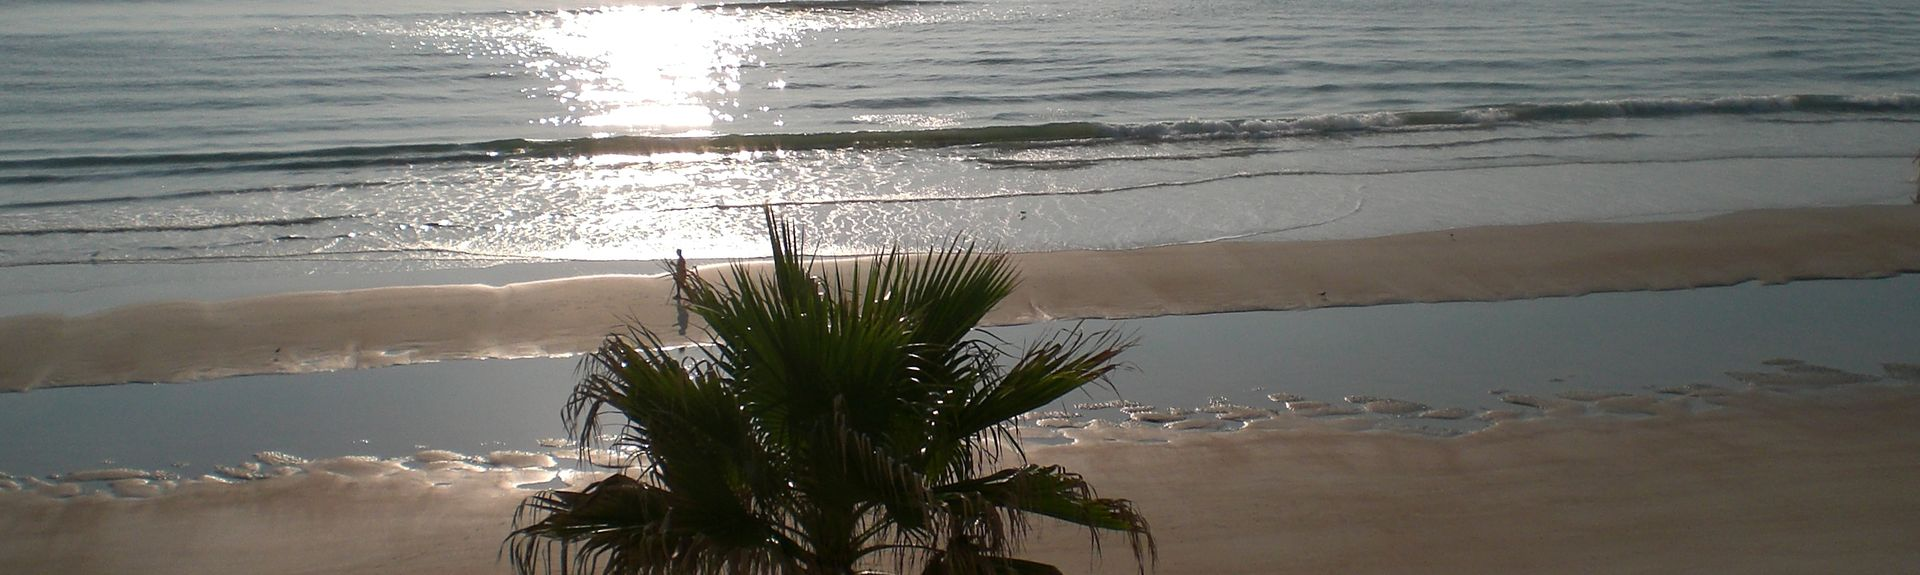 Sand Dollar Condo, Daytona Beach Shores, FL, USA